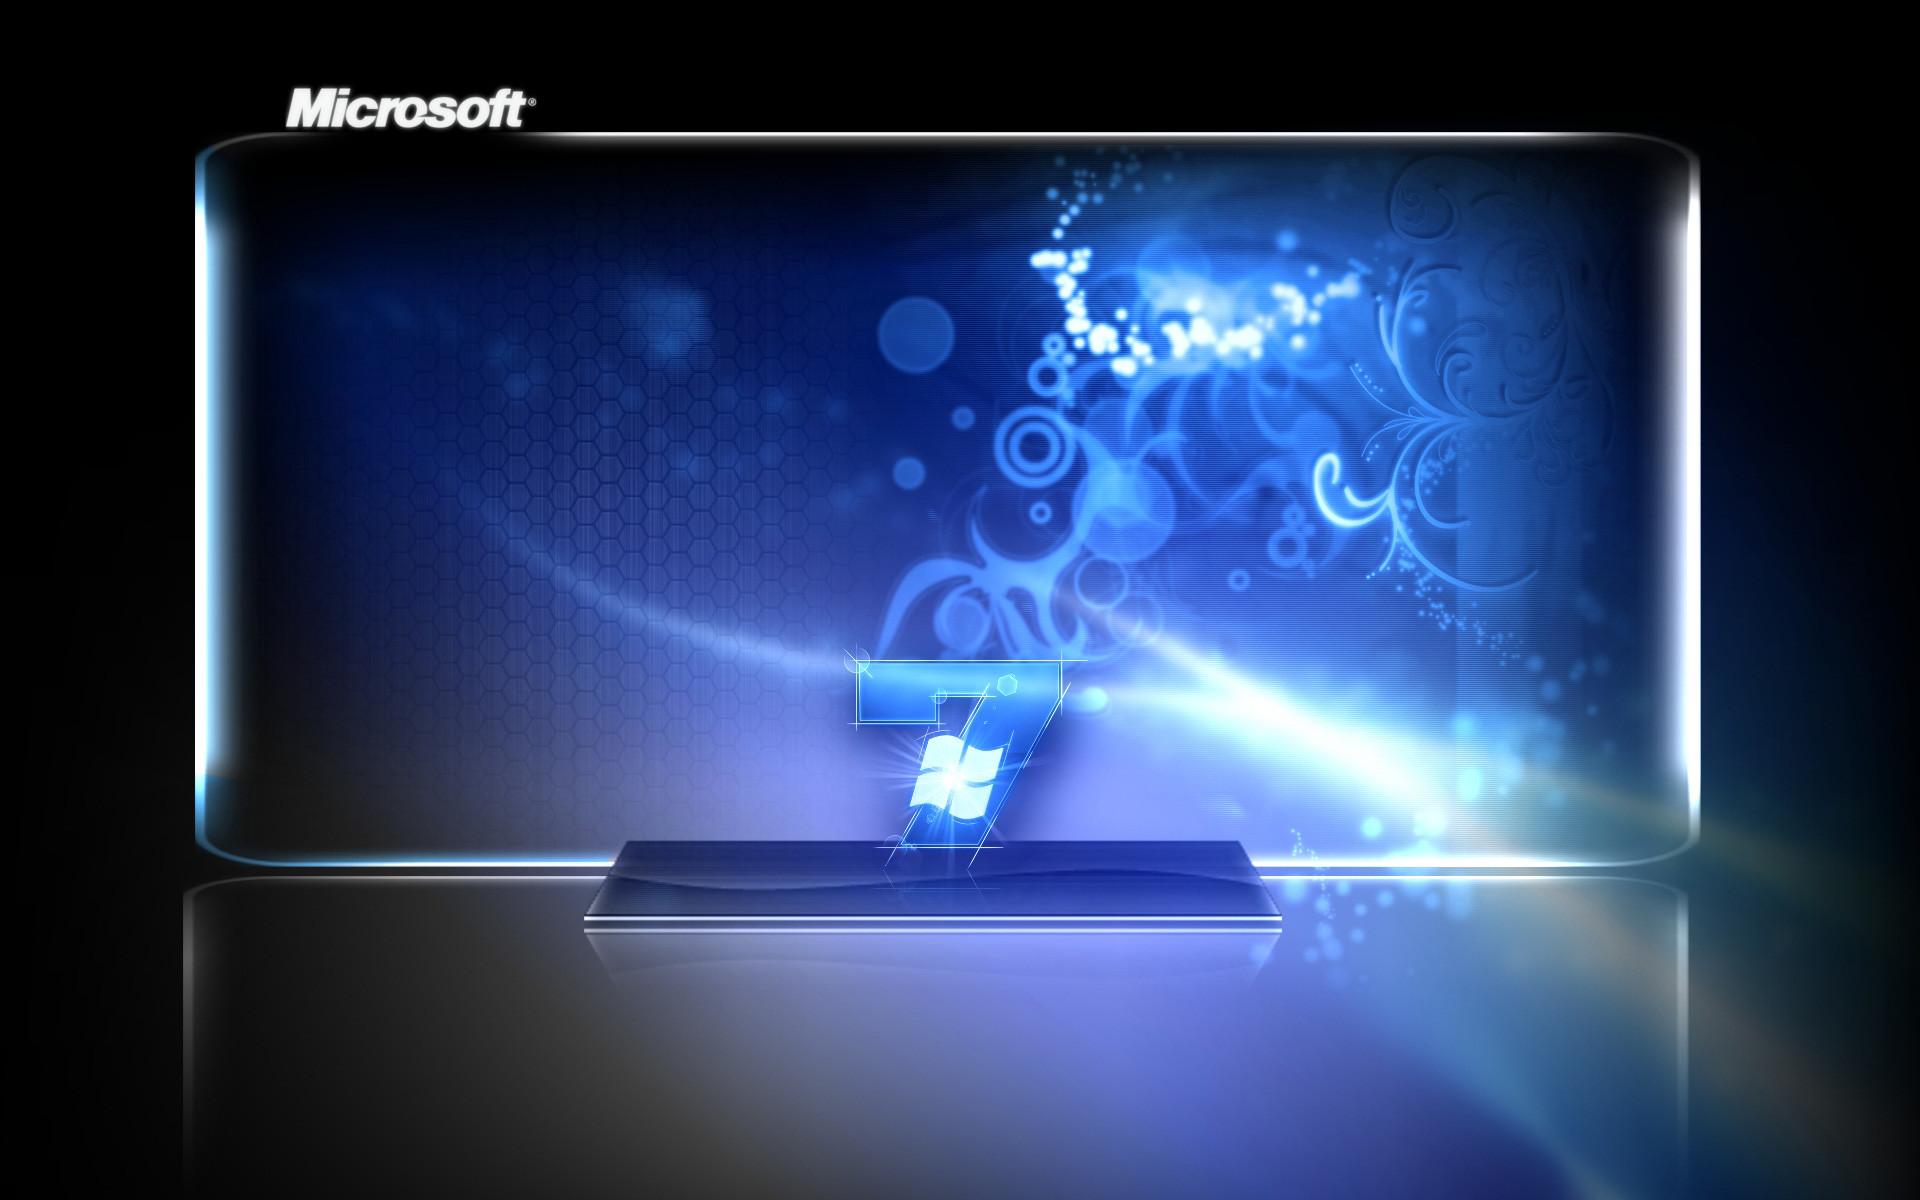 Windows 7 HD Widescreen WallPaper HD – https://imashon.com/brands